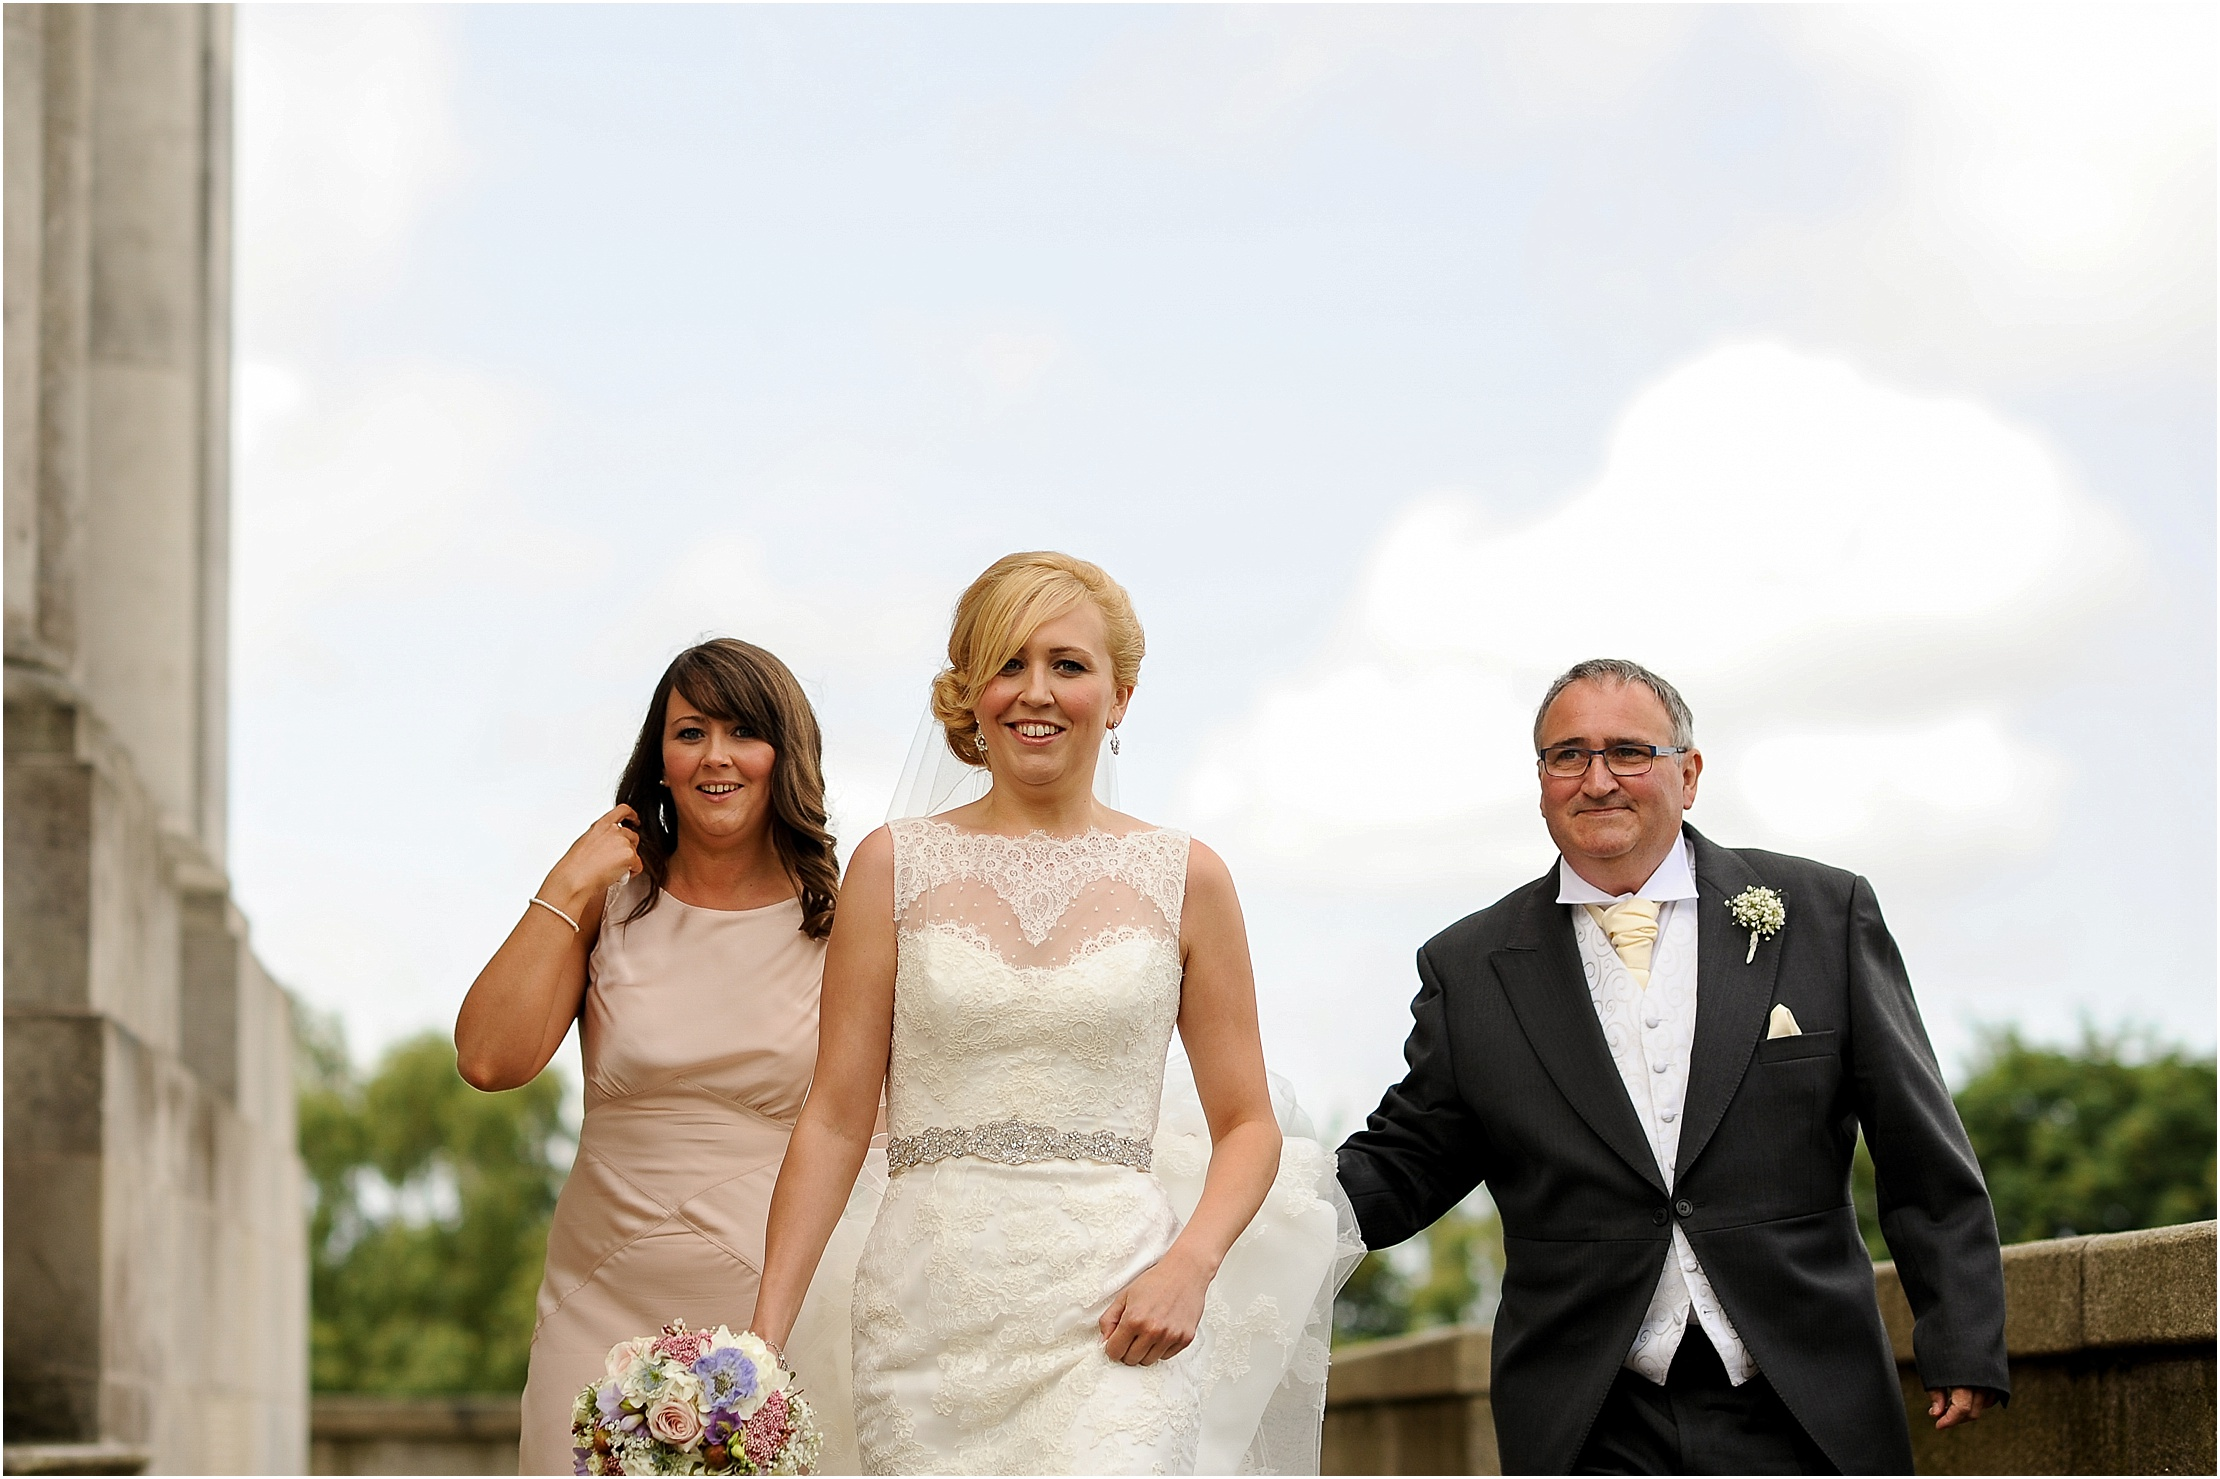 staining-lodge-wedding-046.jpg